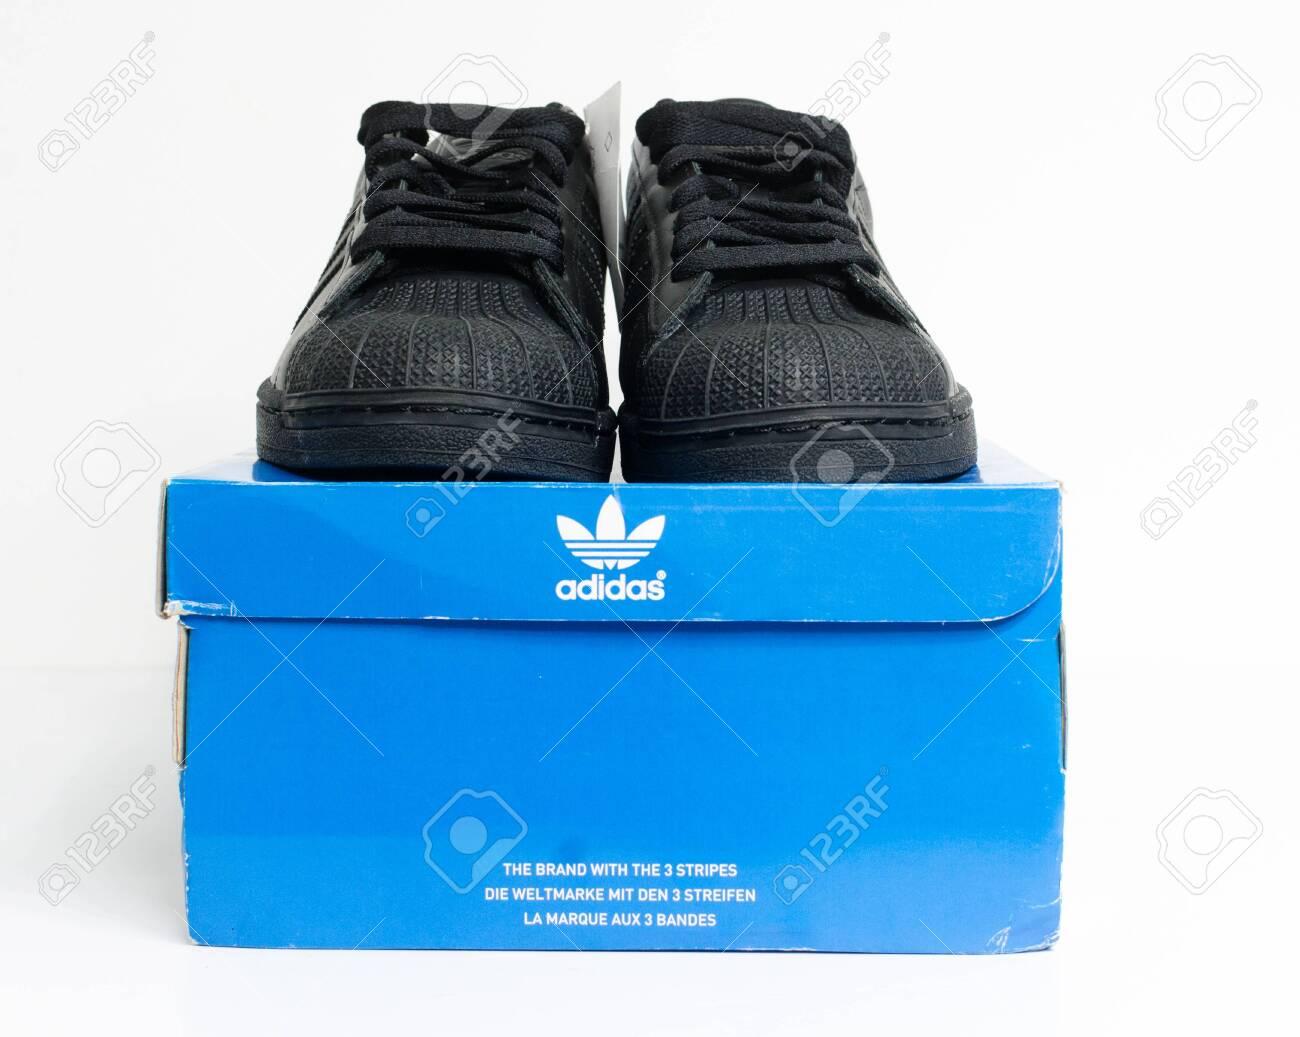 all black adidas shell toes